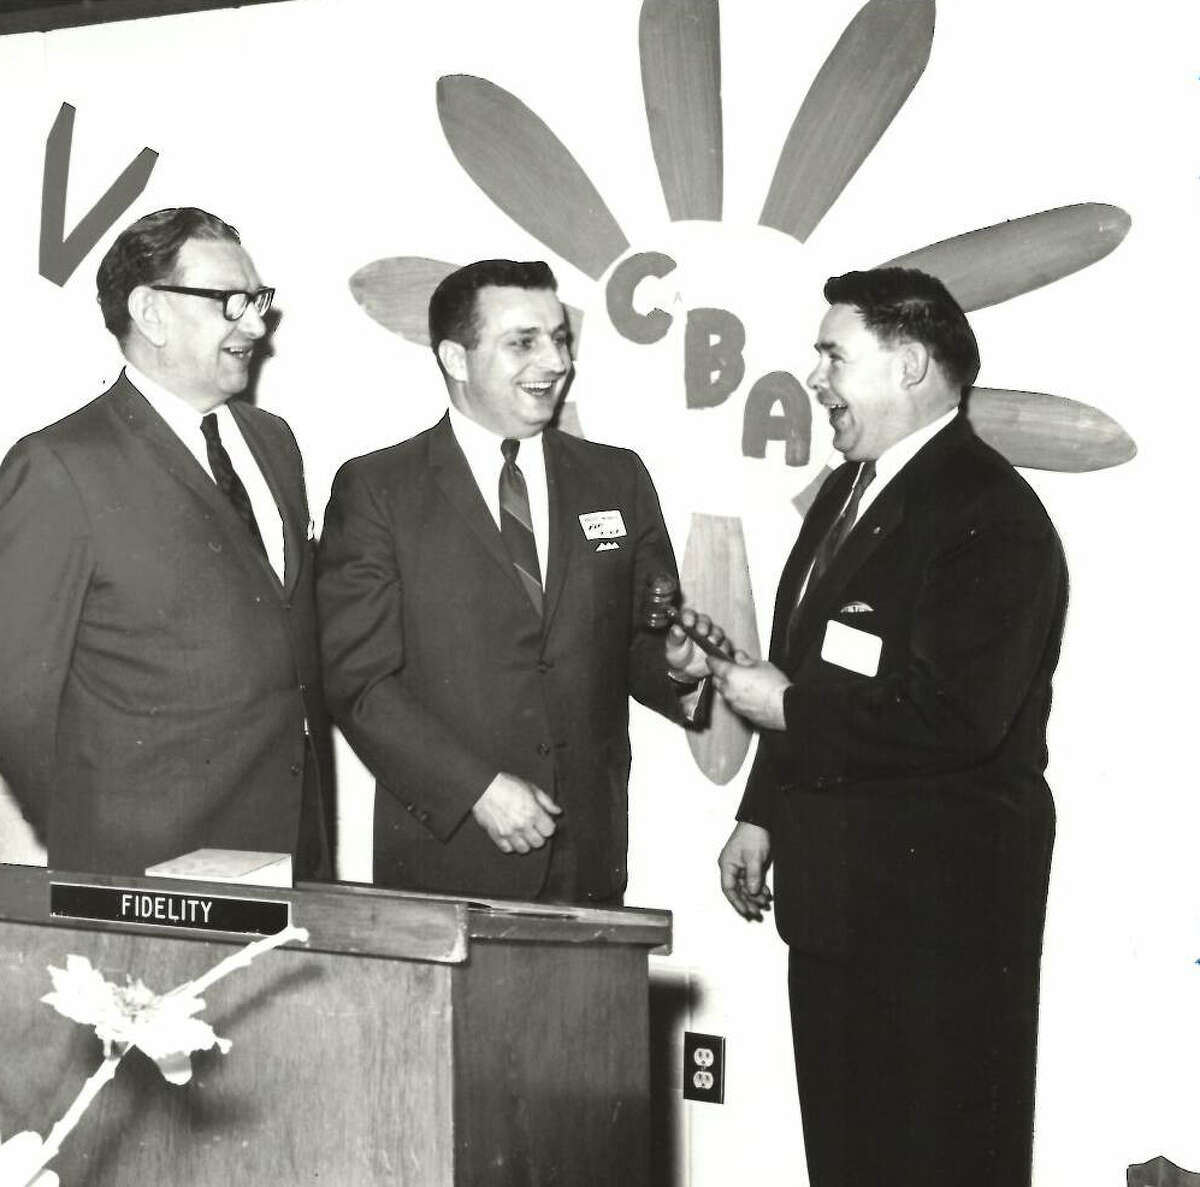 Circle Businessmen's Association. unknown date